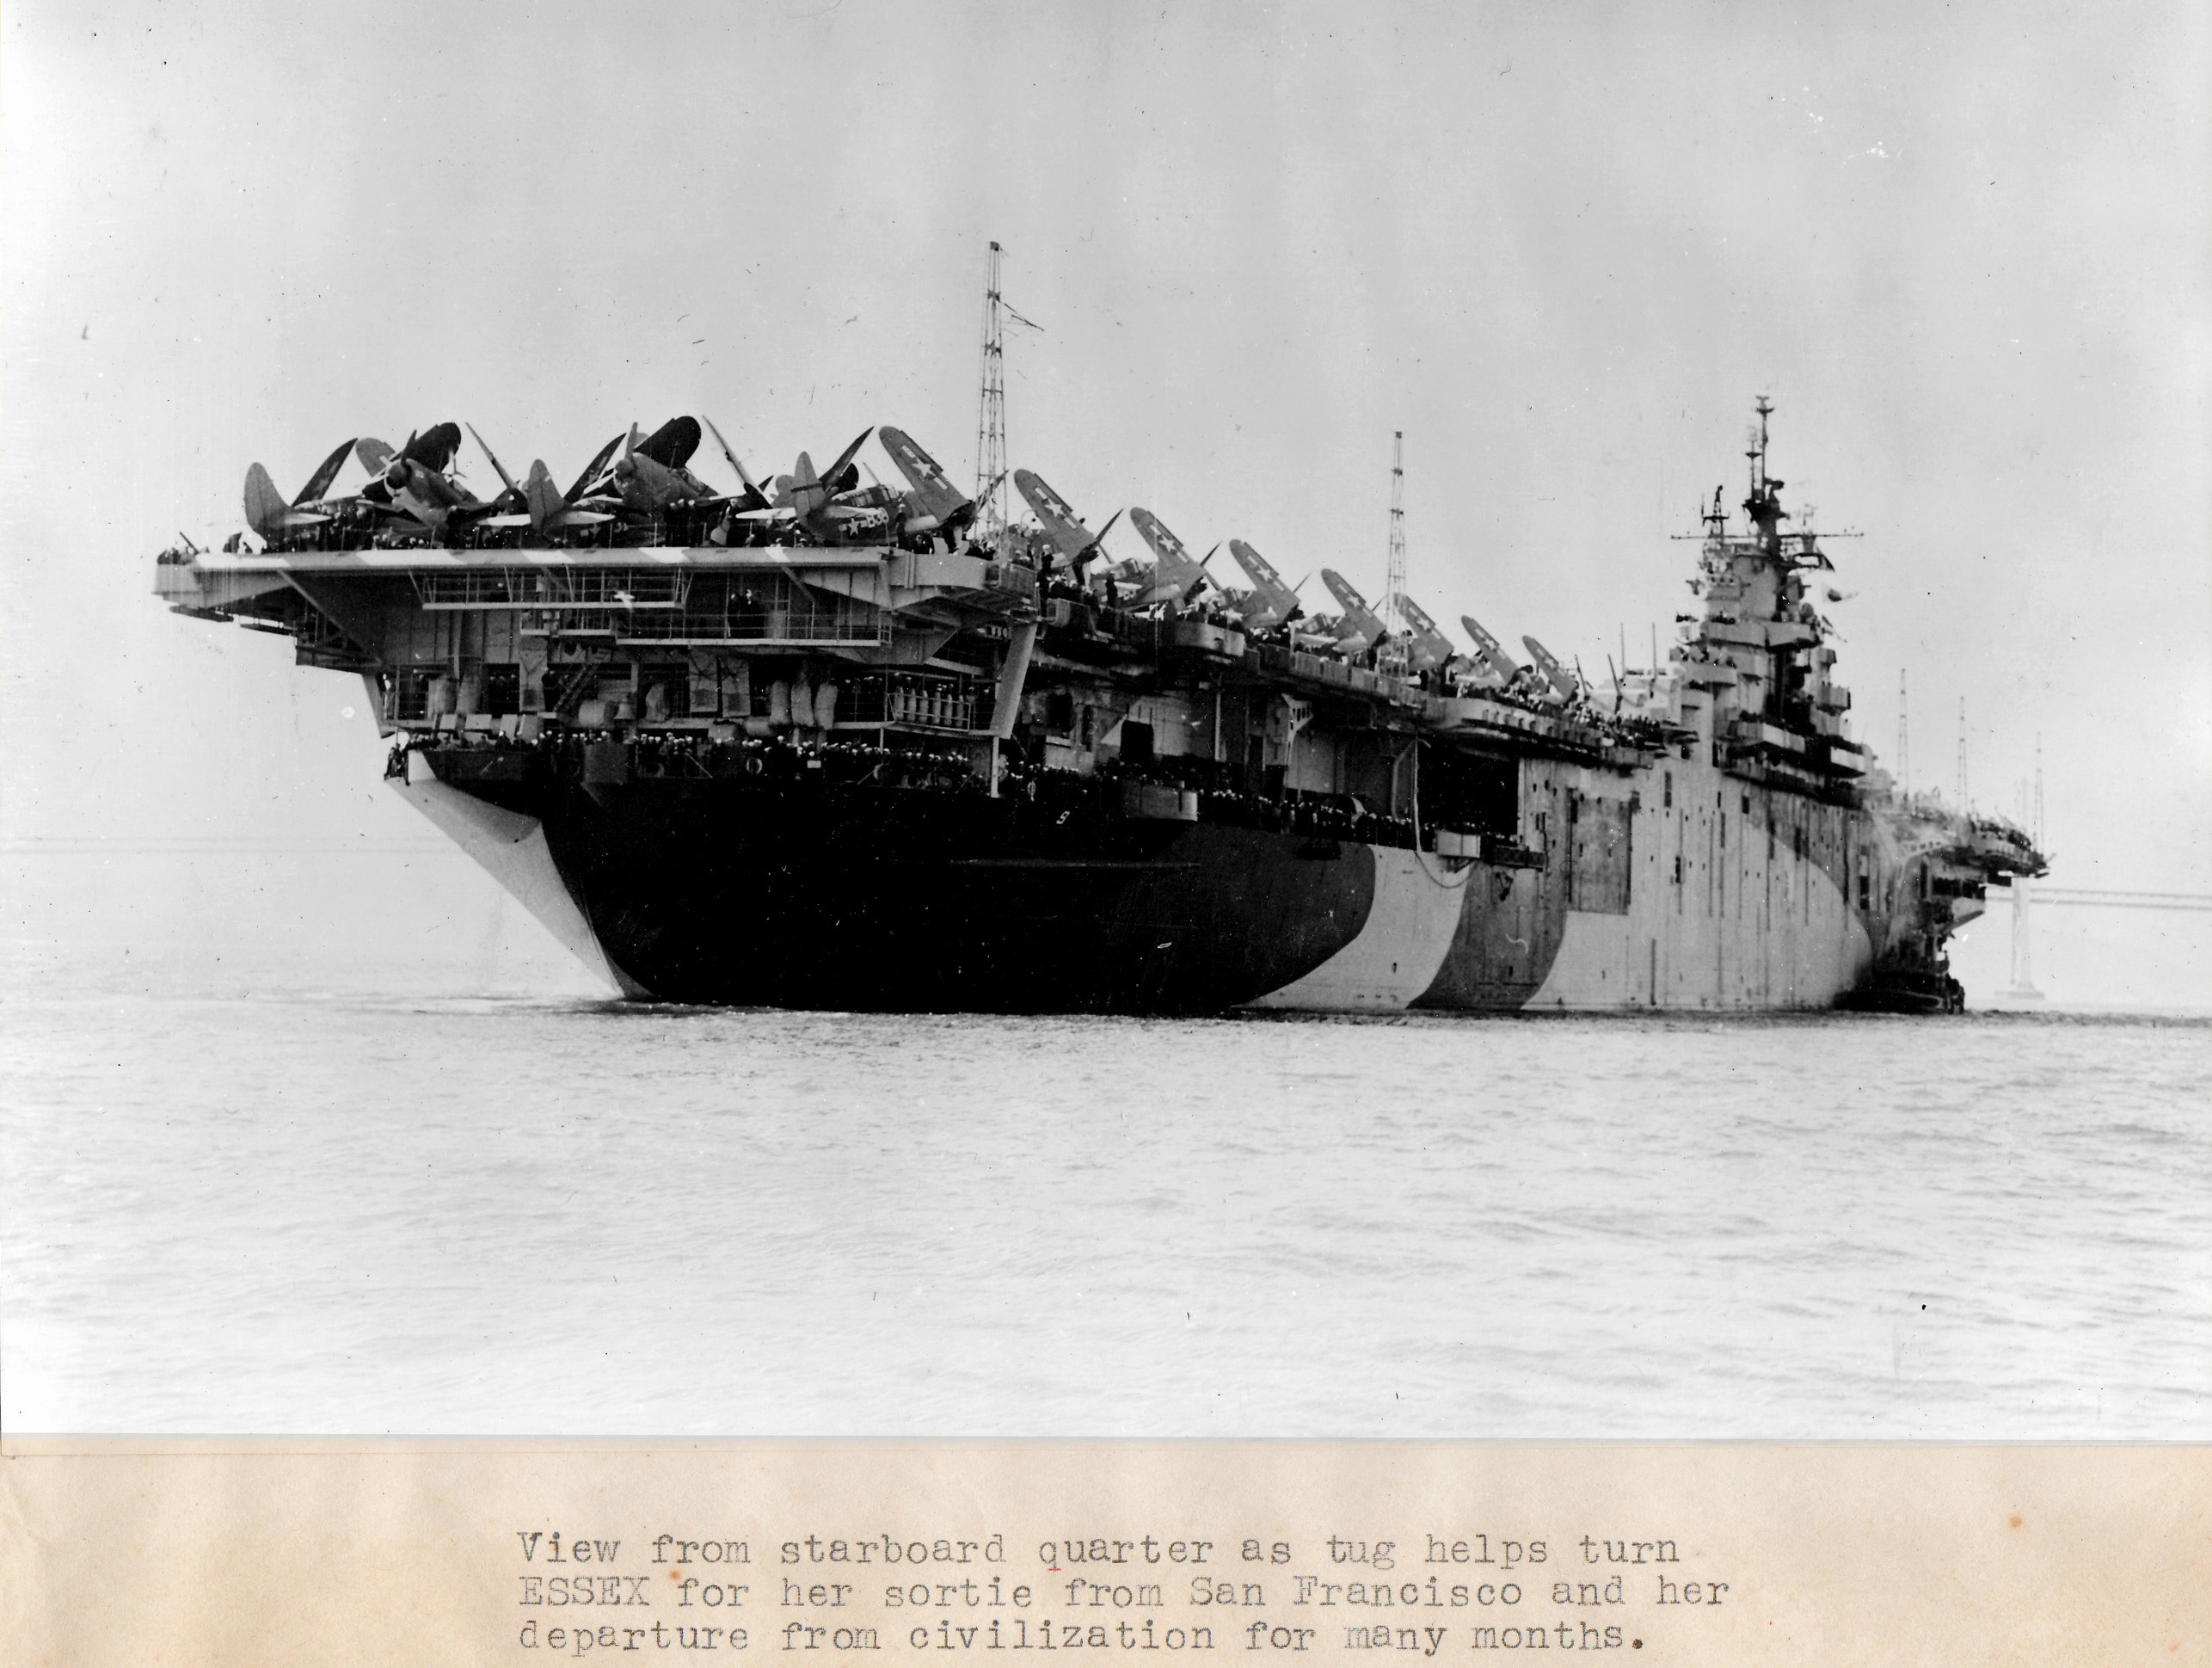 CV 9 USS Essex after her San Francisco refit April 15 1944 01